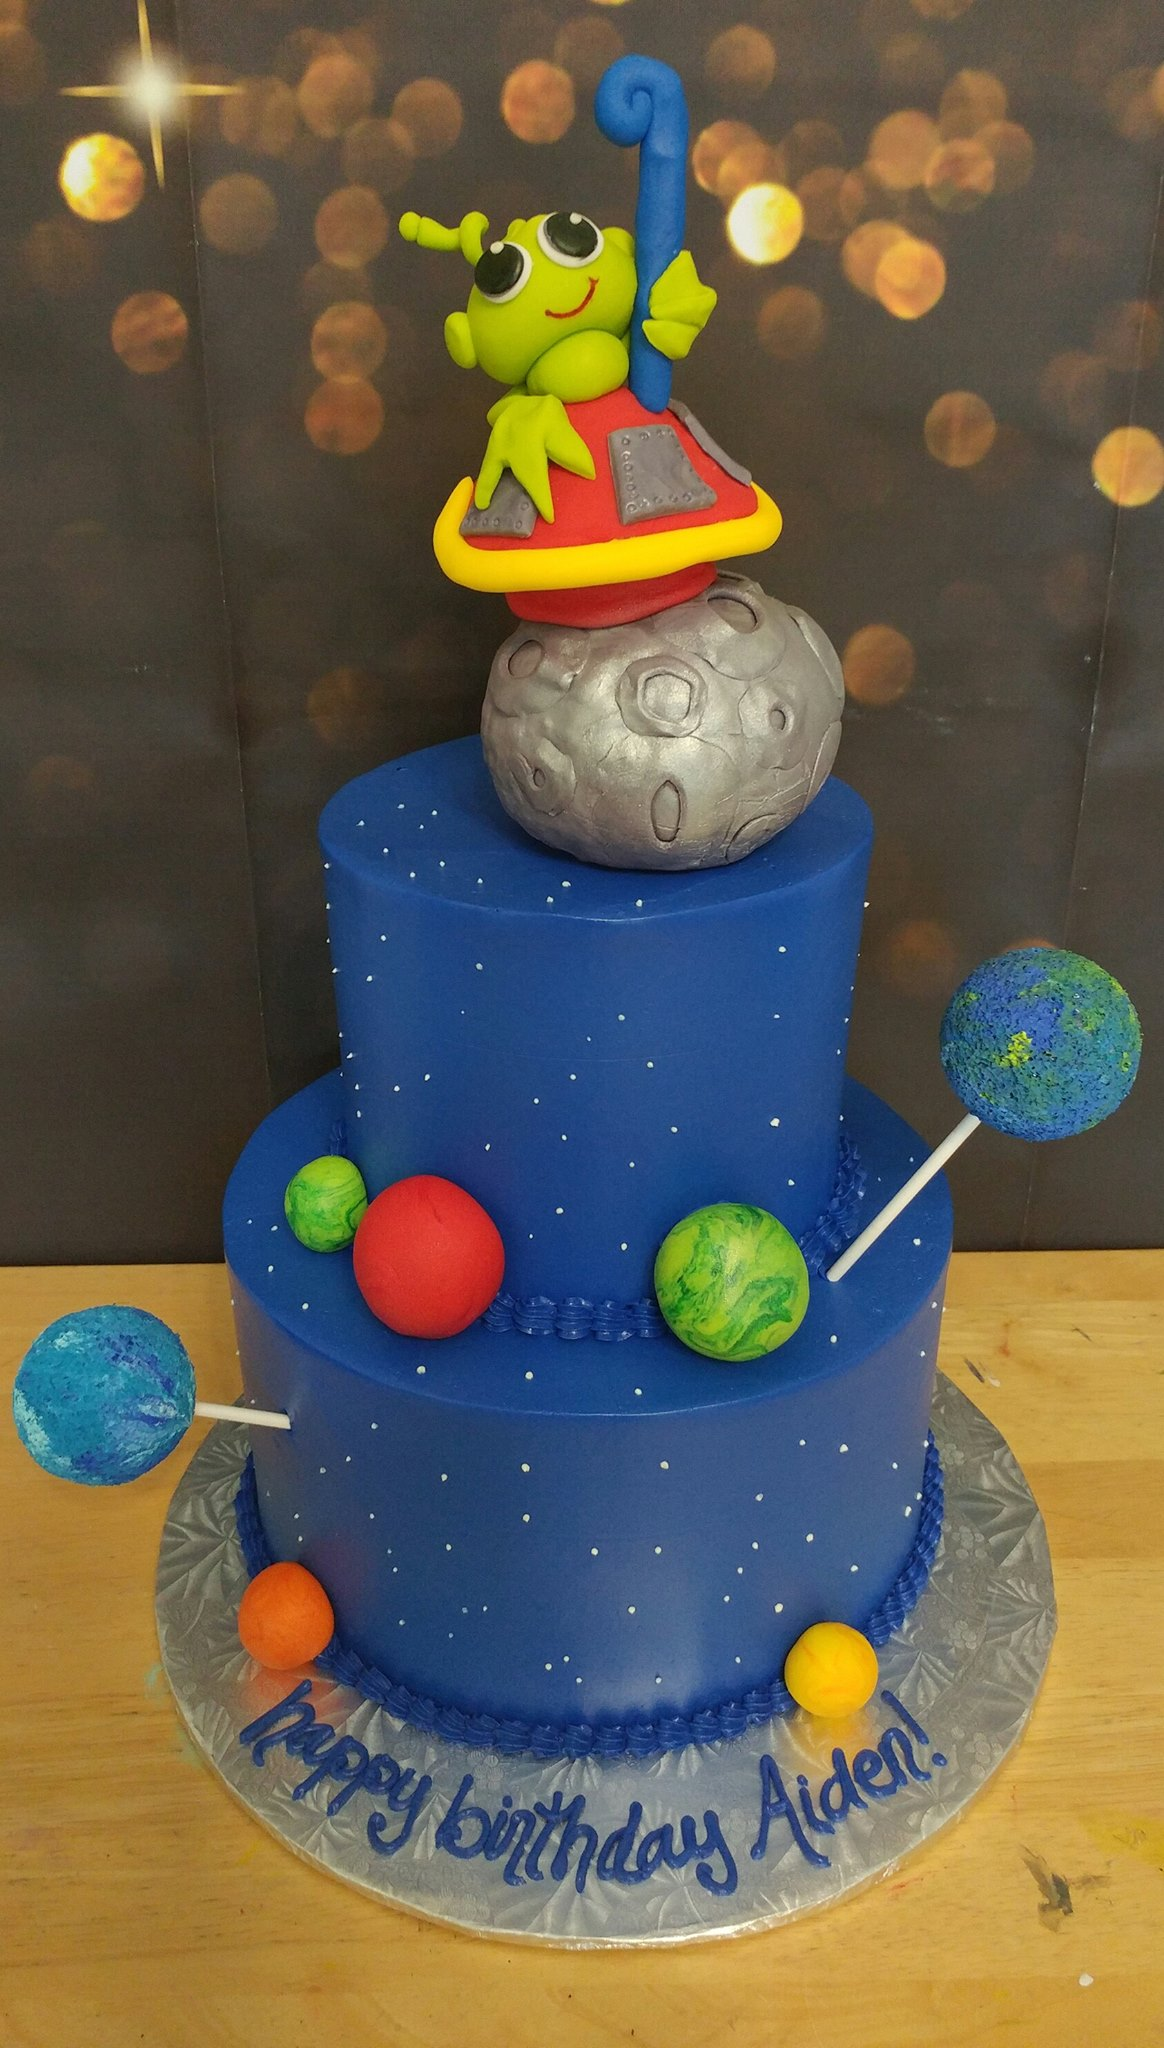 Pleasant Birthday Cakes Greenville Sc Wendi Matt Funny Birthday Cards Online Kookostrdamsfinfo